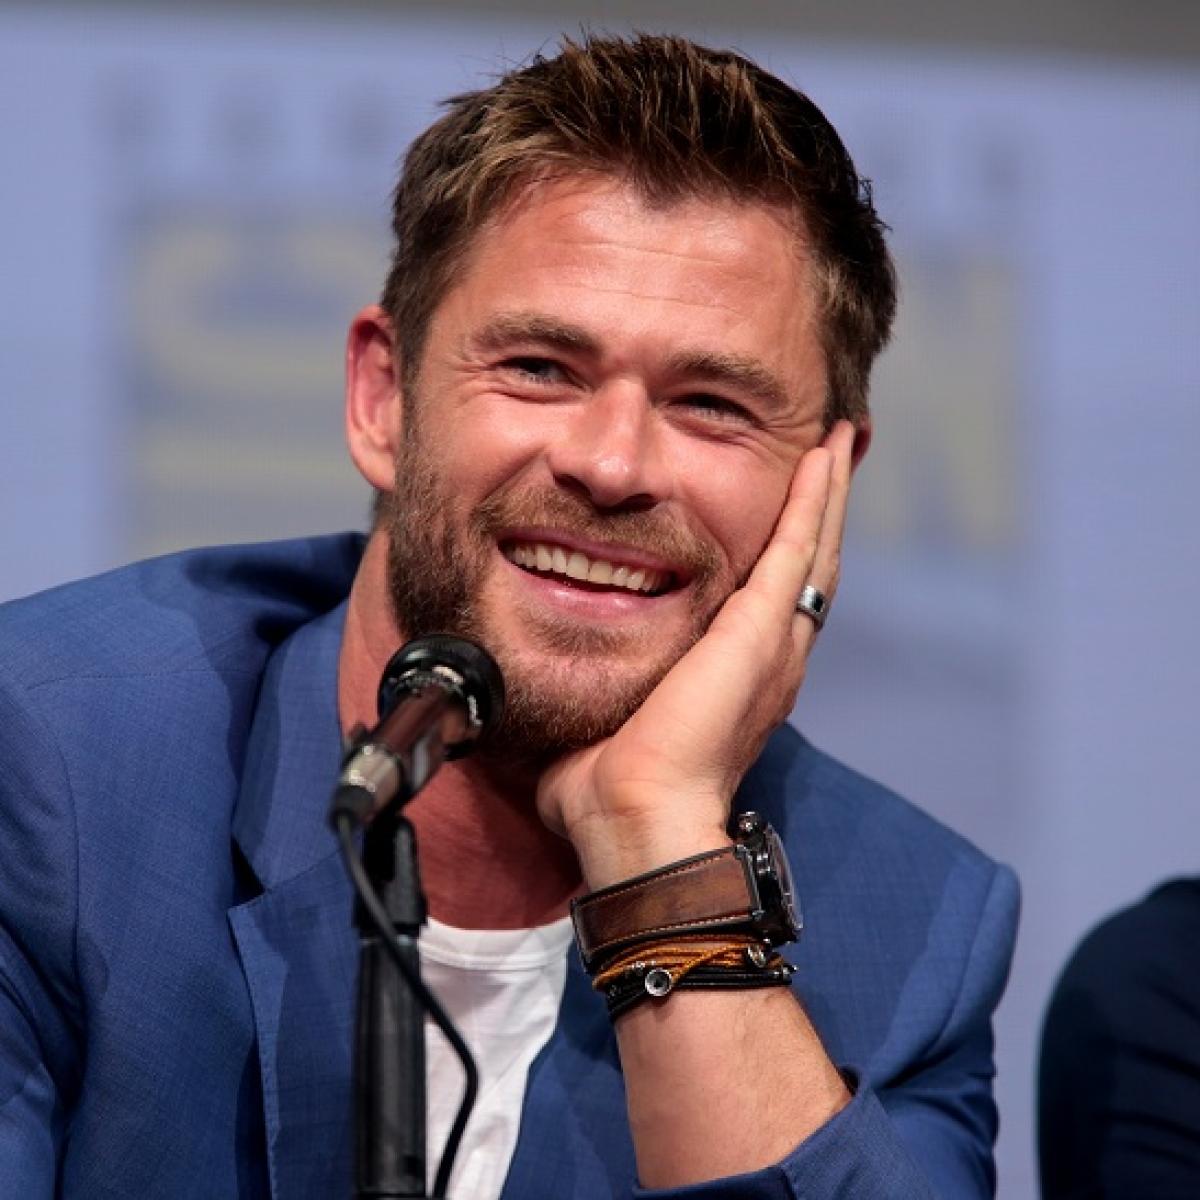 Chris Hemsworth says script of Hulk Hogan biopic is 'deep in development'